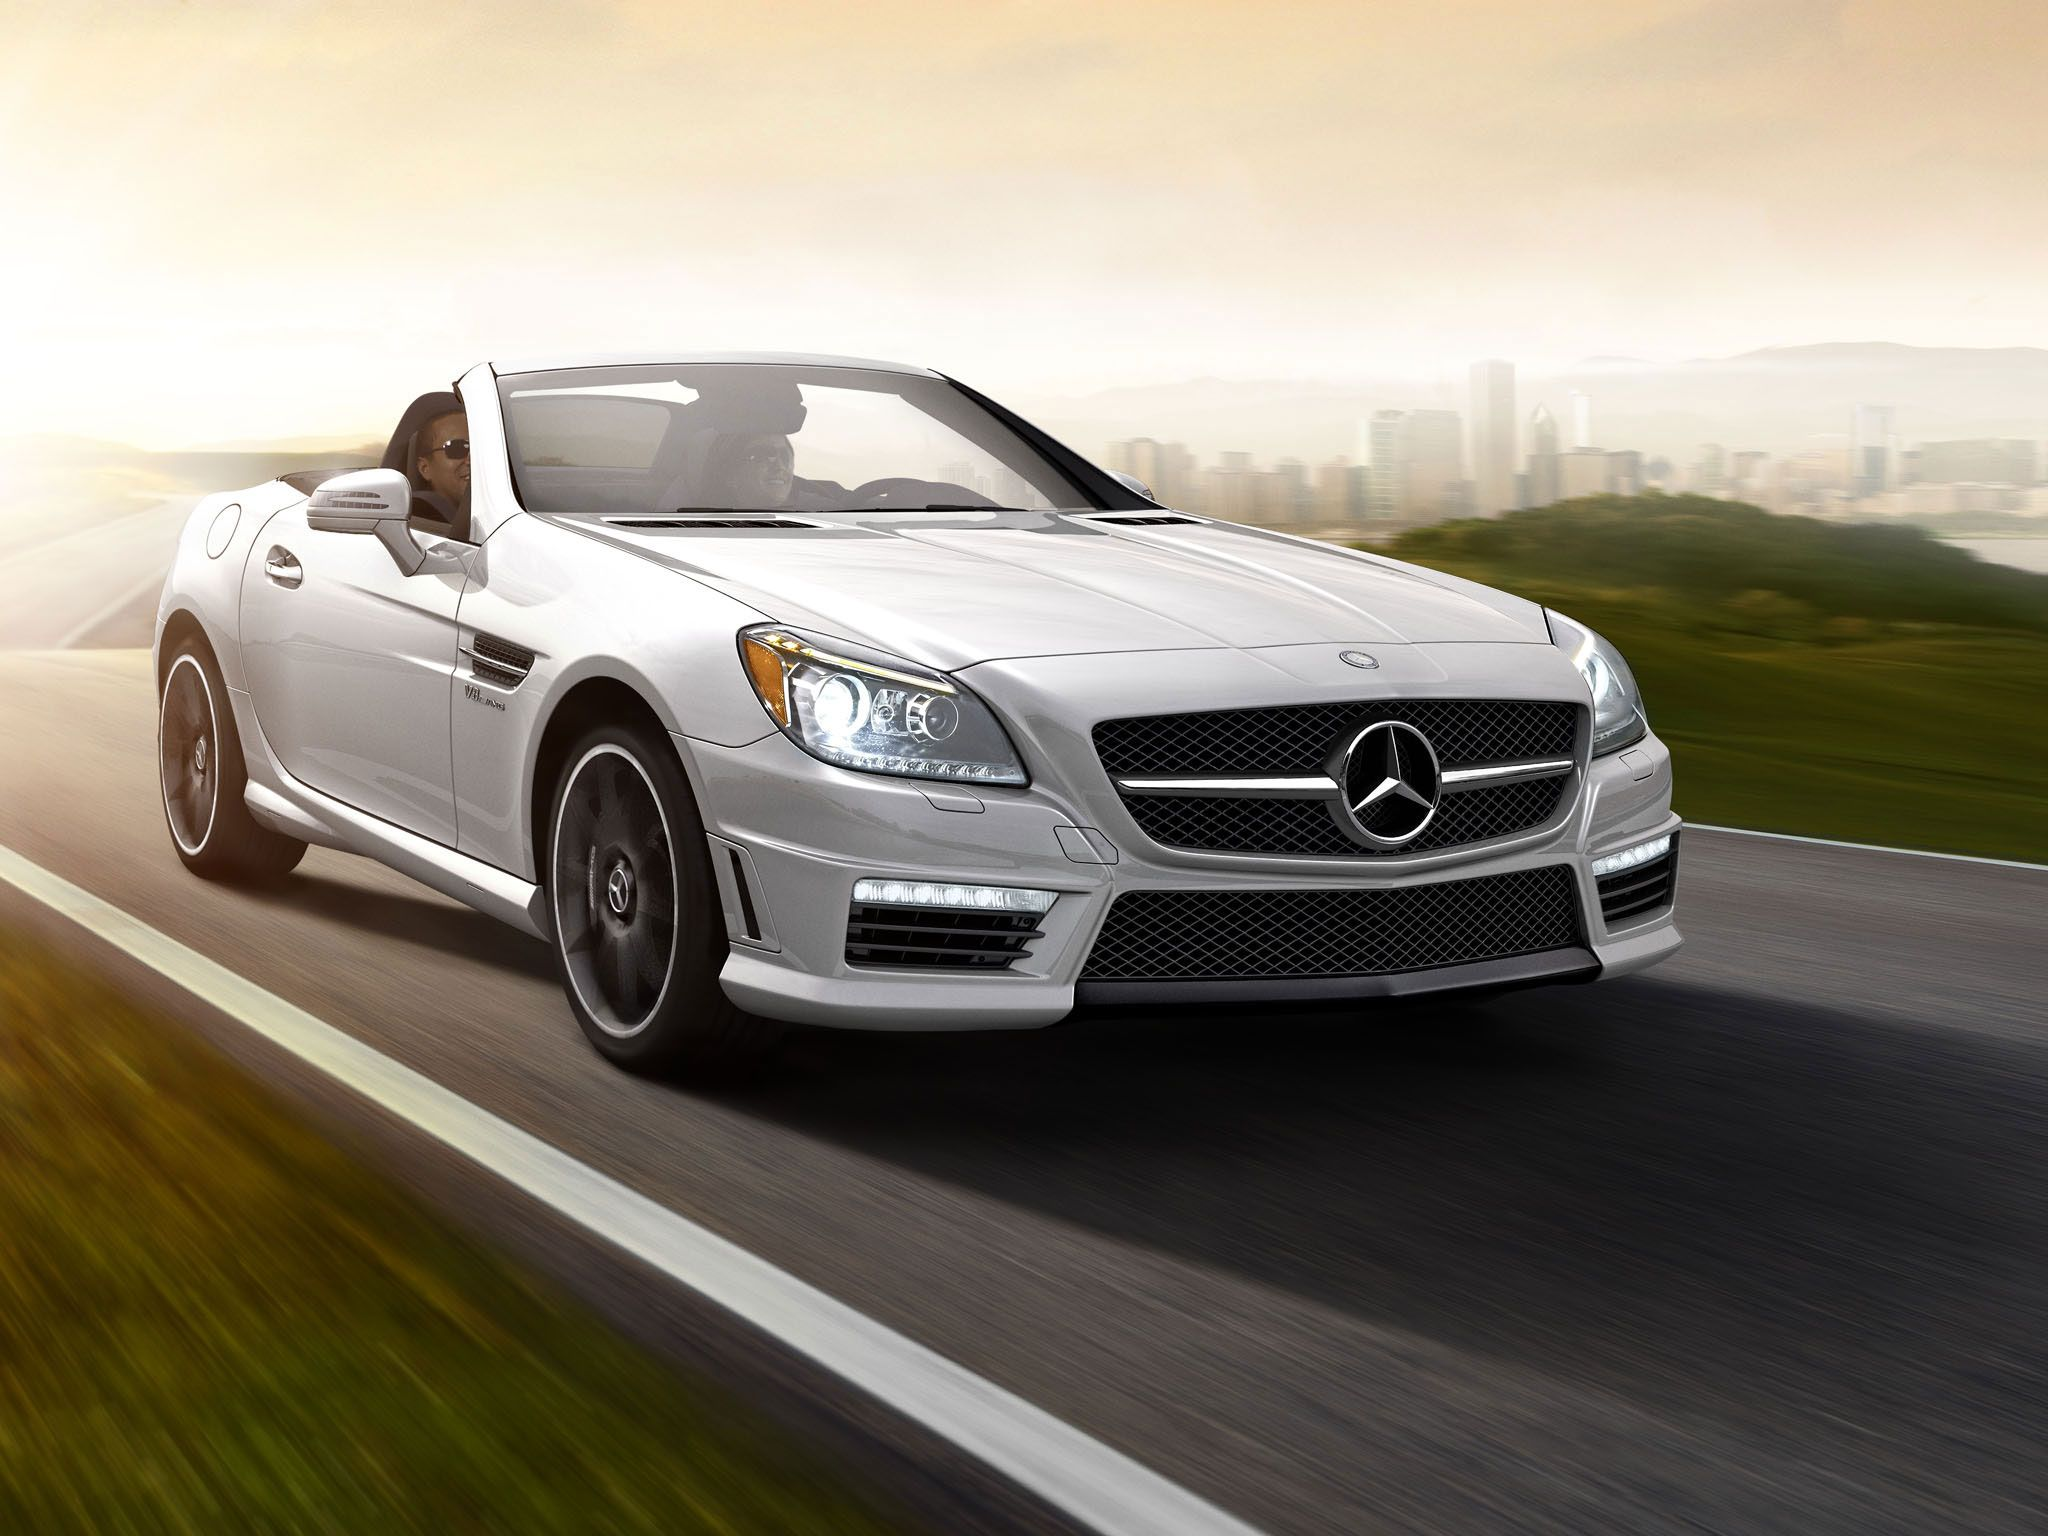 Mercedes Benz Slk55 Amg In Diamond White With Matte Black Amg